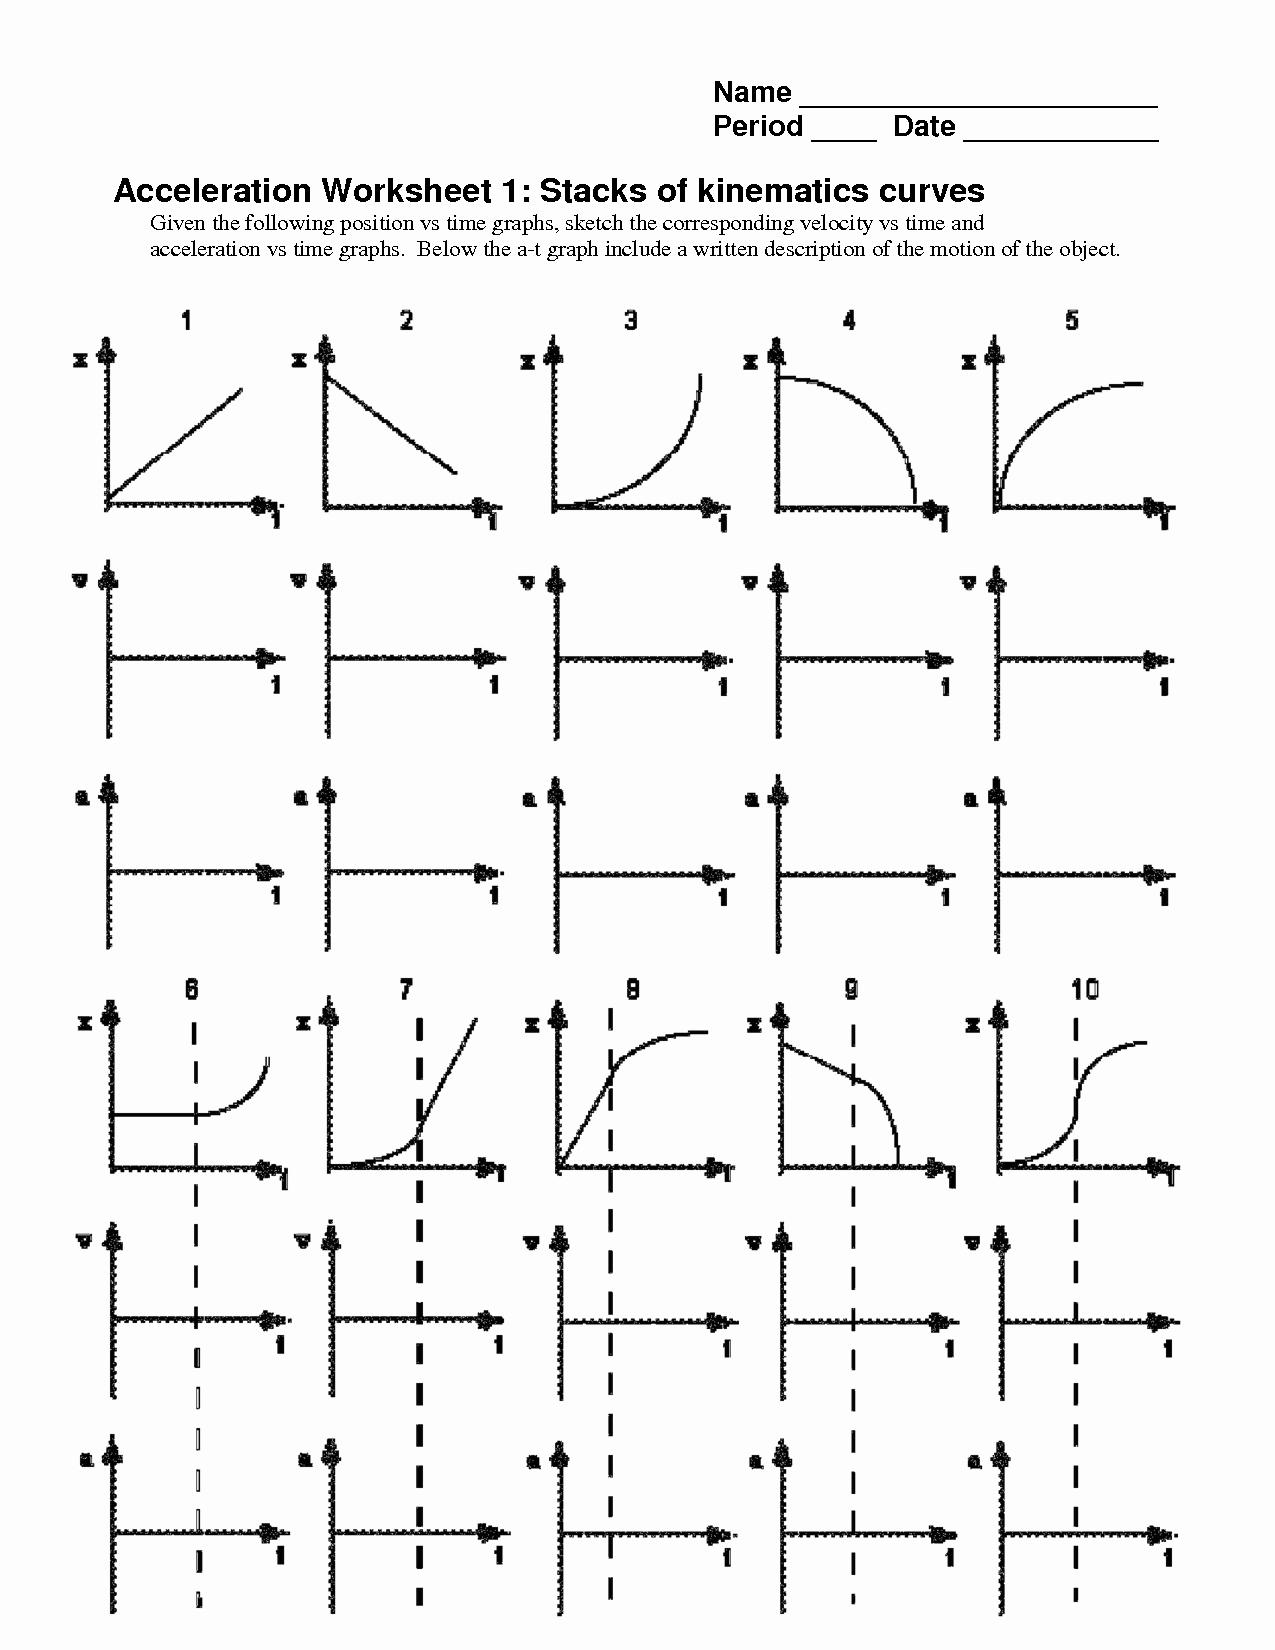 Motion Graphs Worksheet Answer Key Inspirational Kinematics Motion Graph Worksheets the Best Worksheets